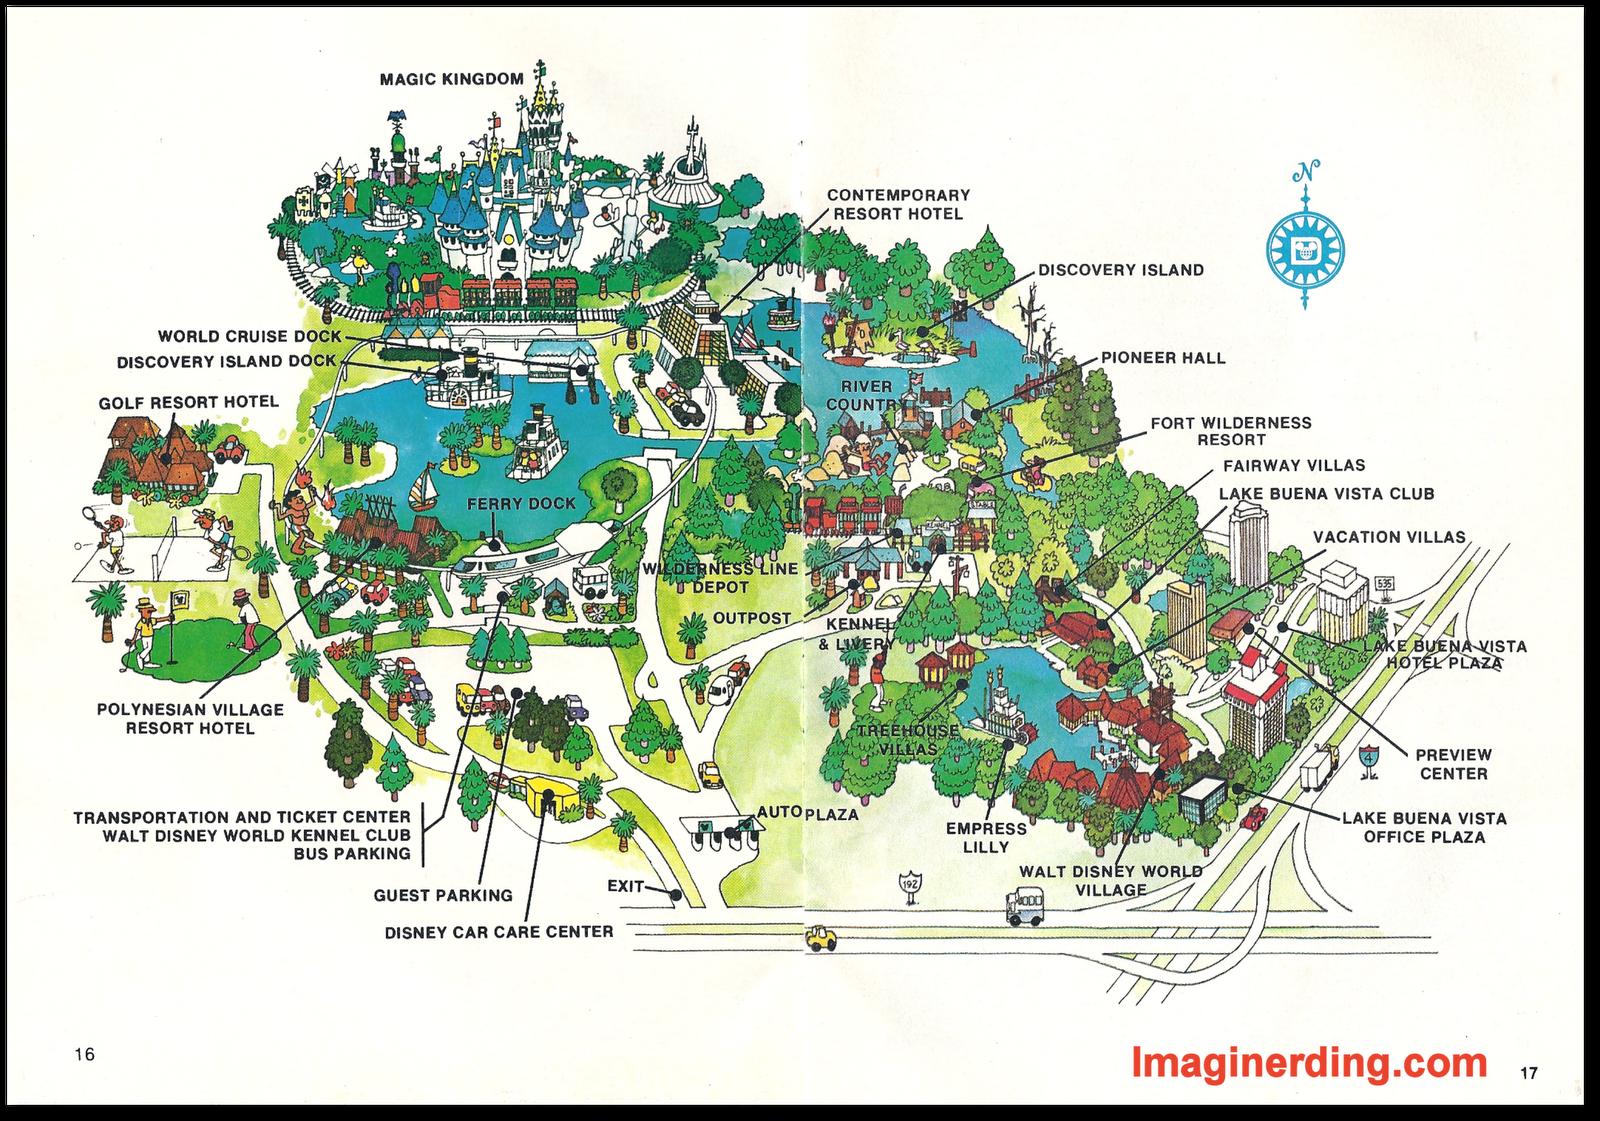 Imaginerding Disney books history links and more June 2011